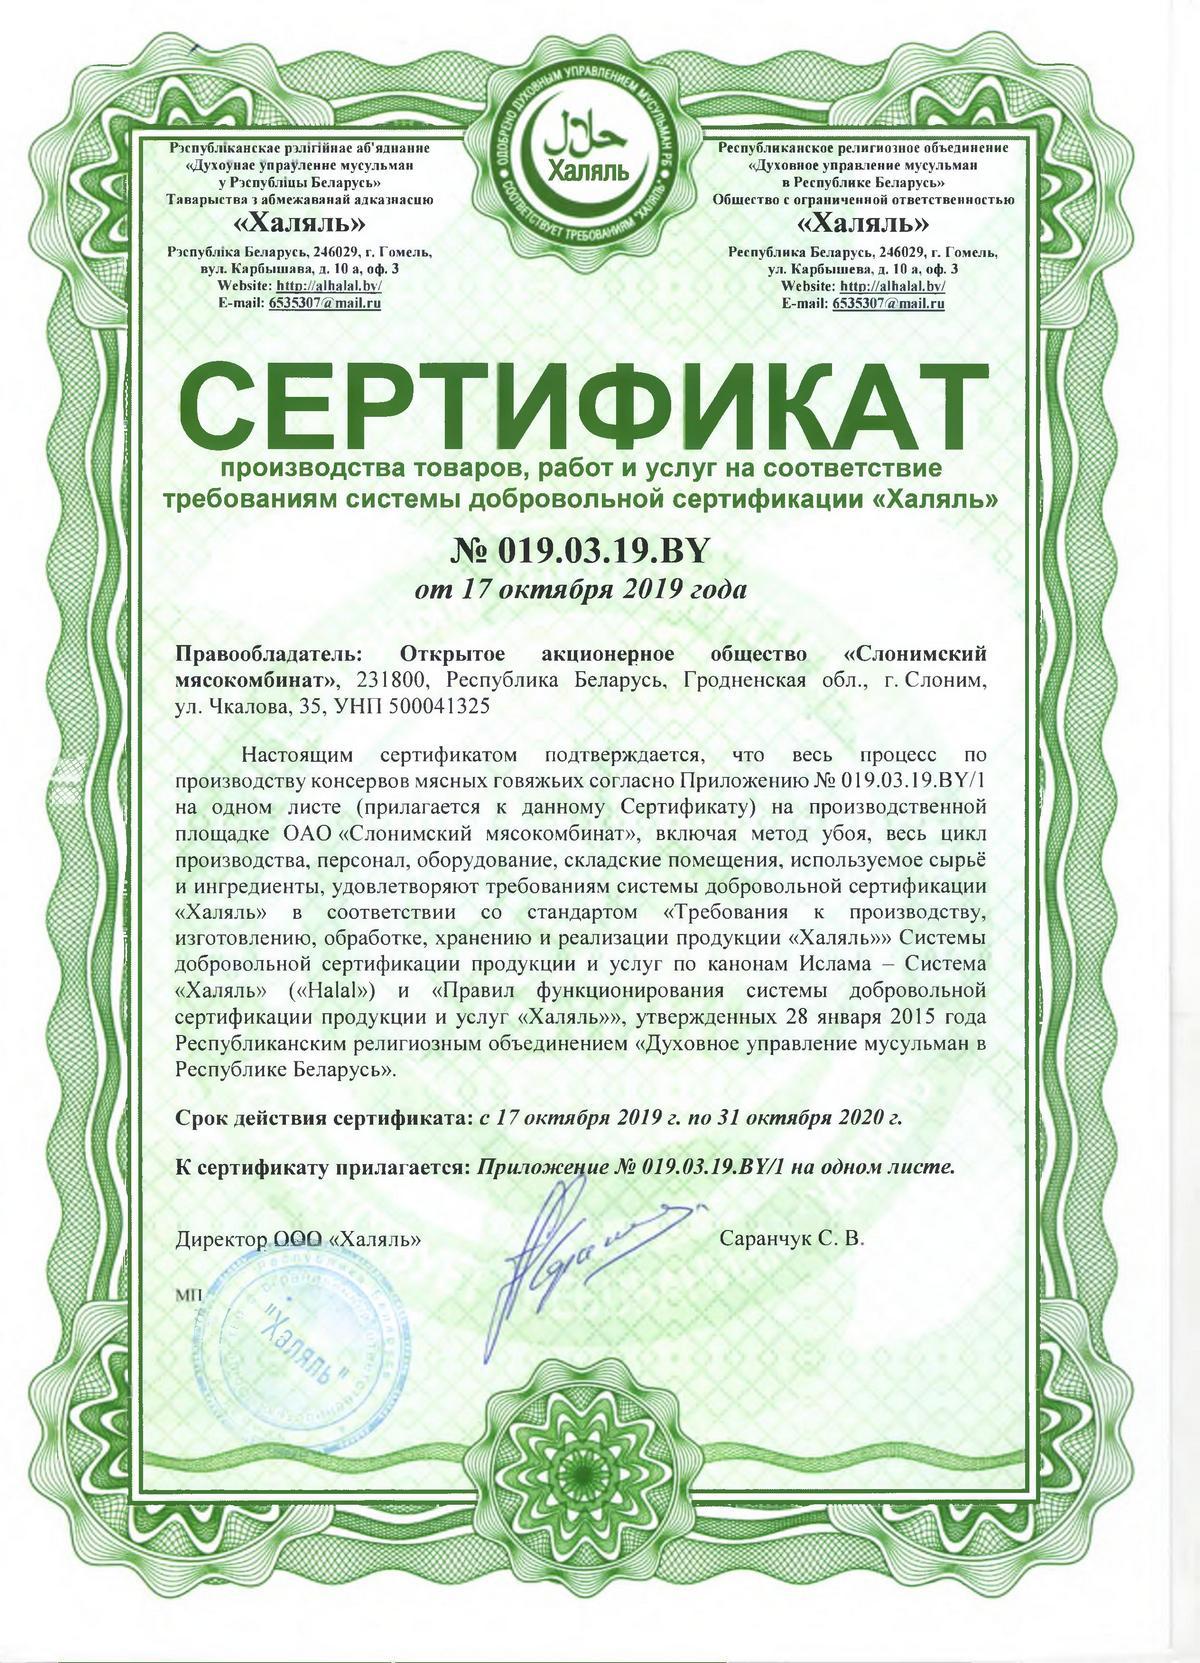 ОАО «Слонимский мясокомбинат» 5